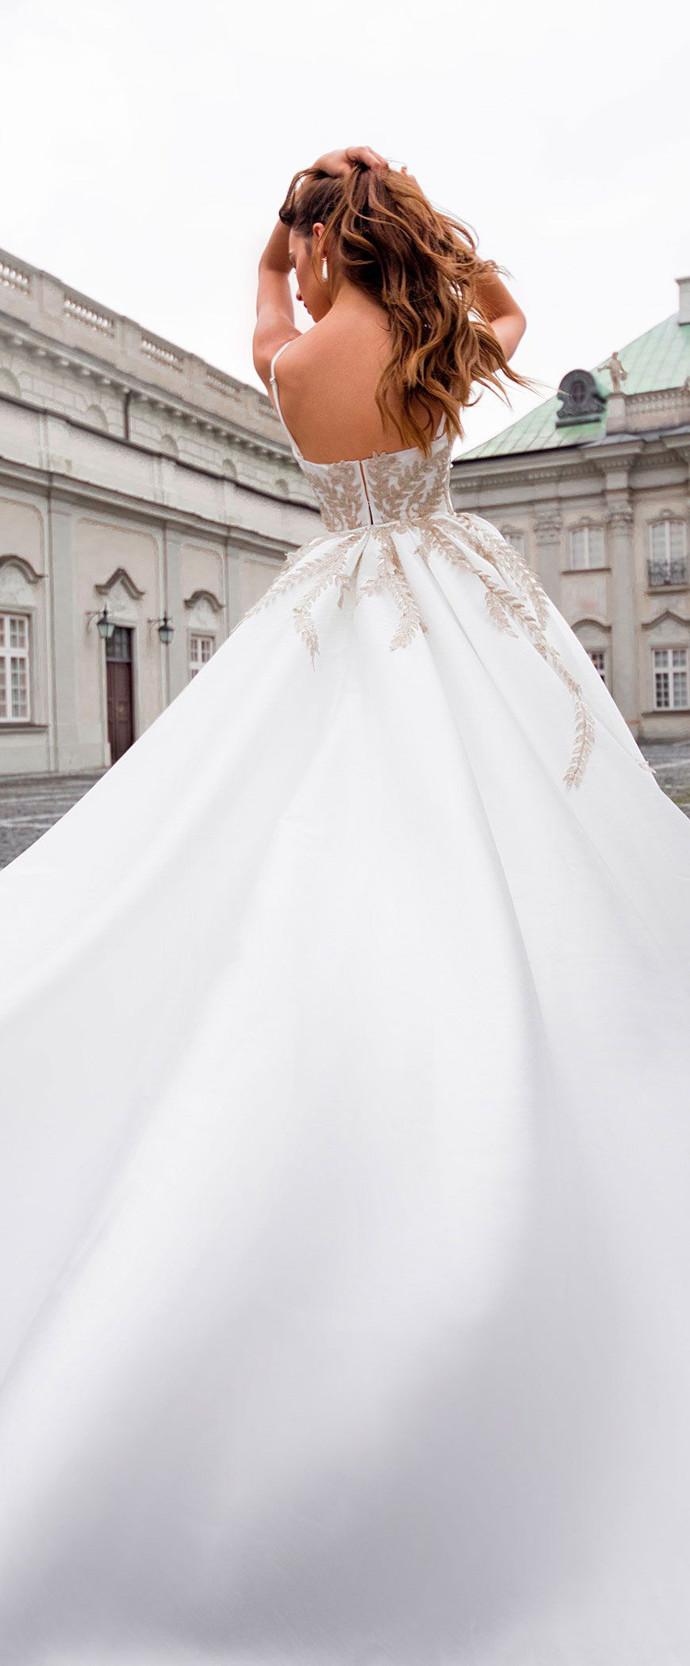 Spaghetti Strap Ball Gown Wedding Dress Featuring Leaf Appliqués and Long Train